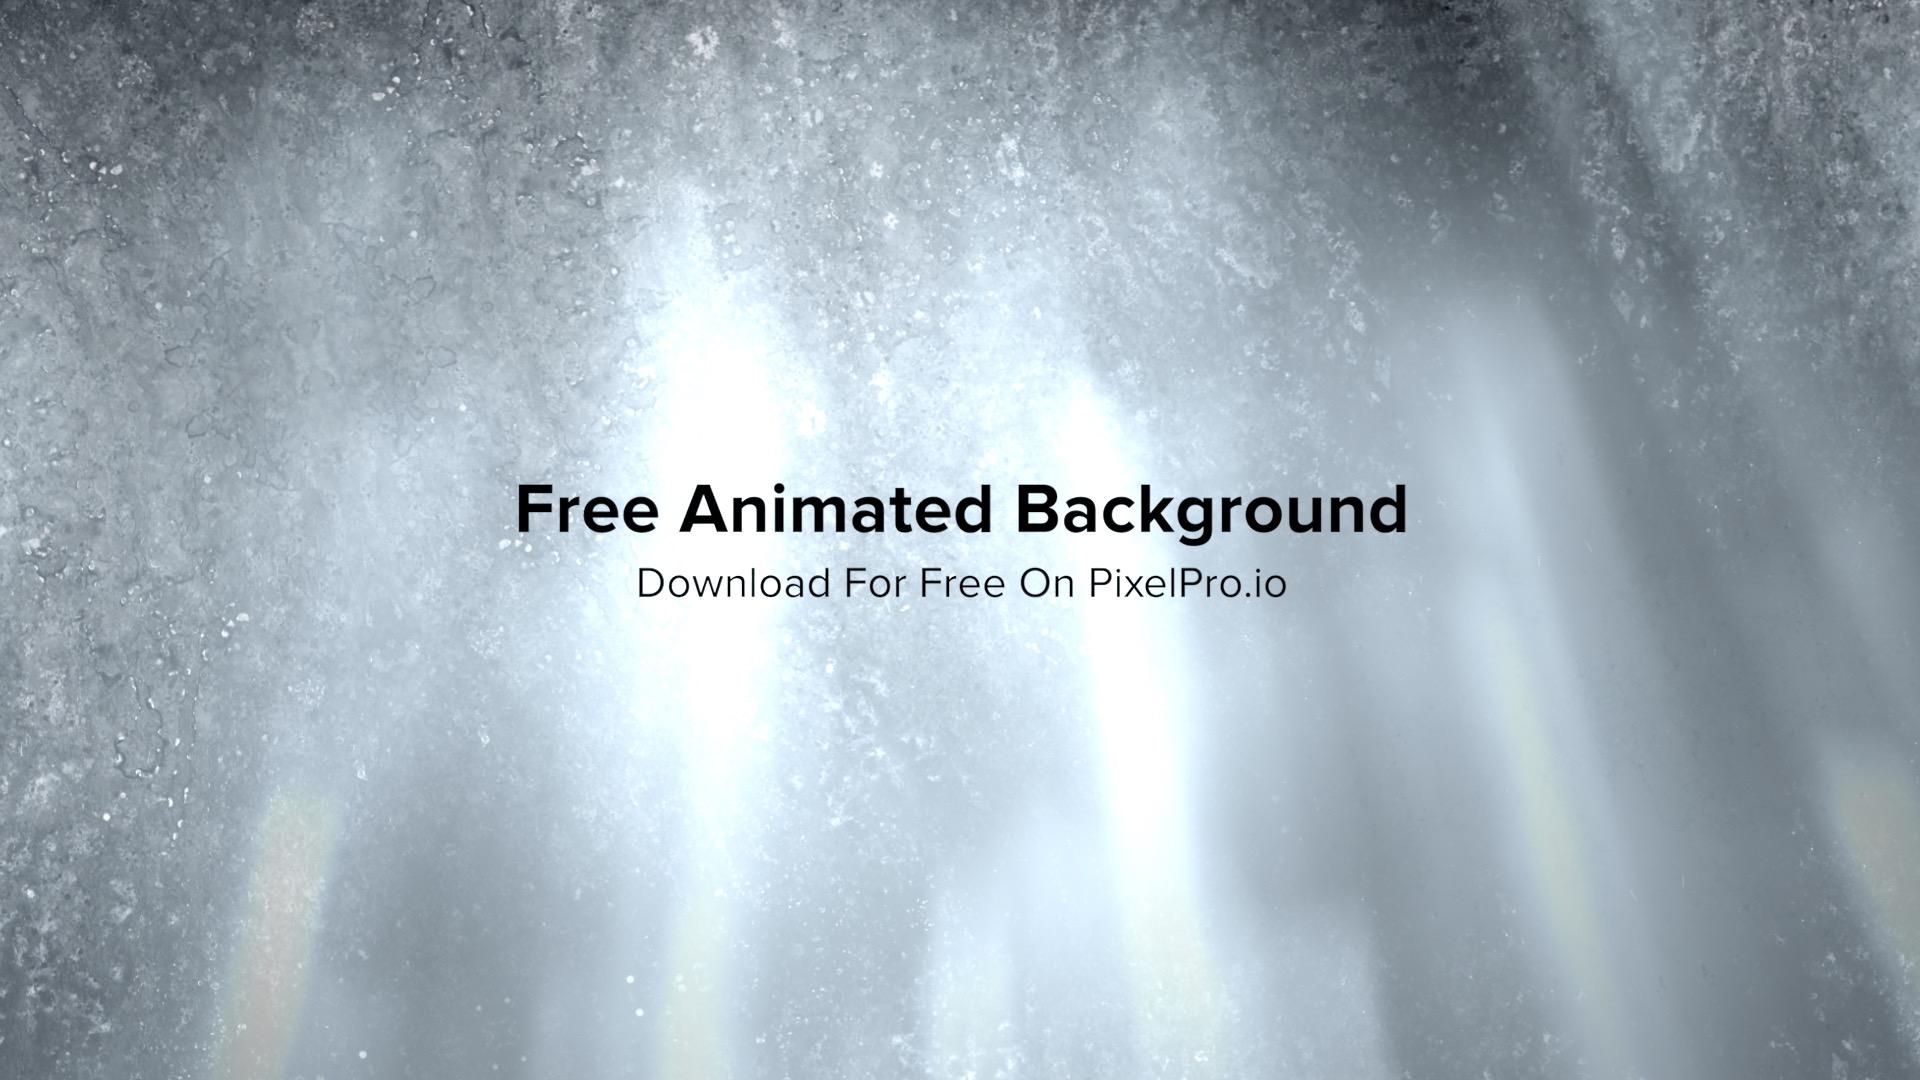 PixelPro Animated Background 5.jpg